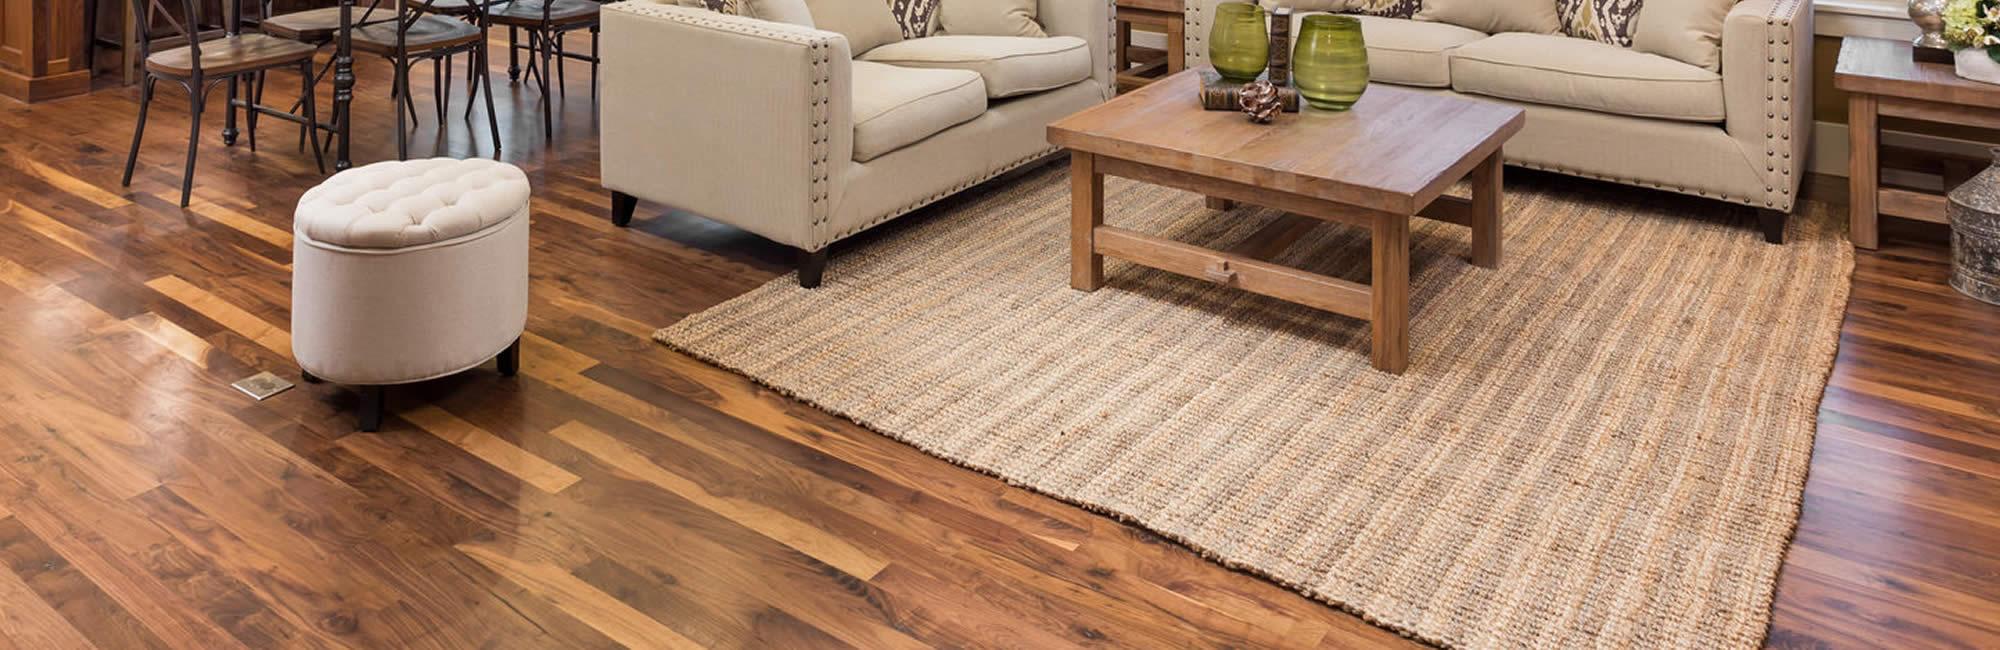 Czar wood floor company kenosha wood floor services for Wood flooring companies near me